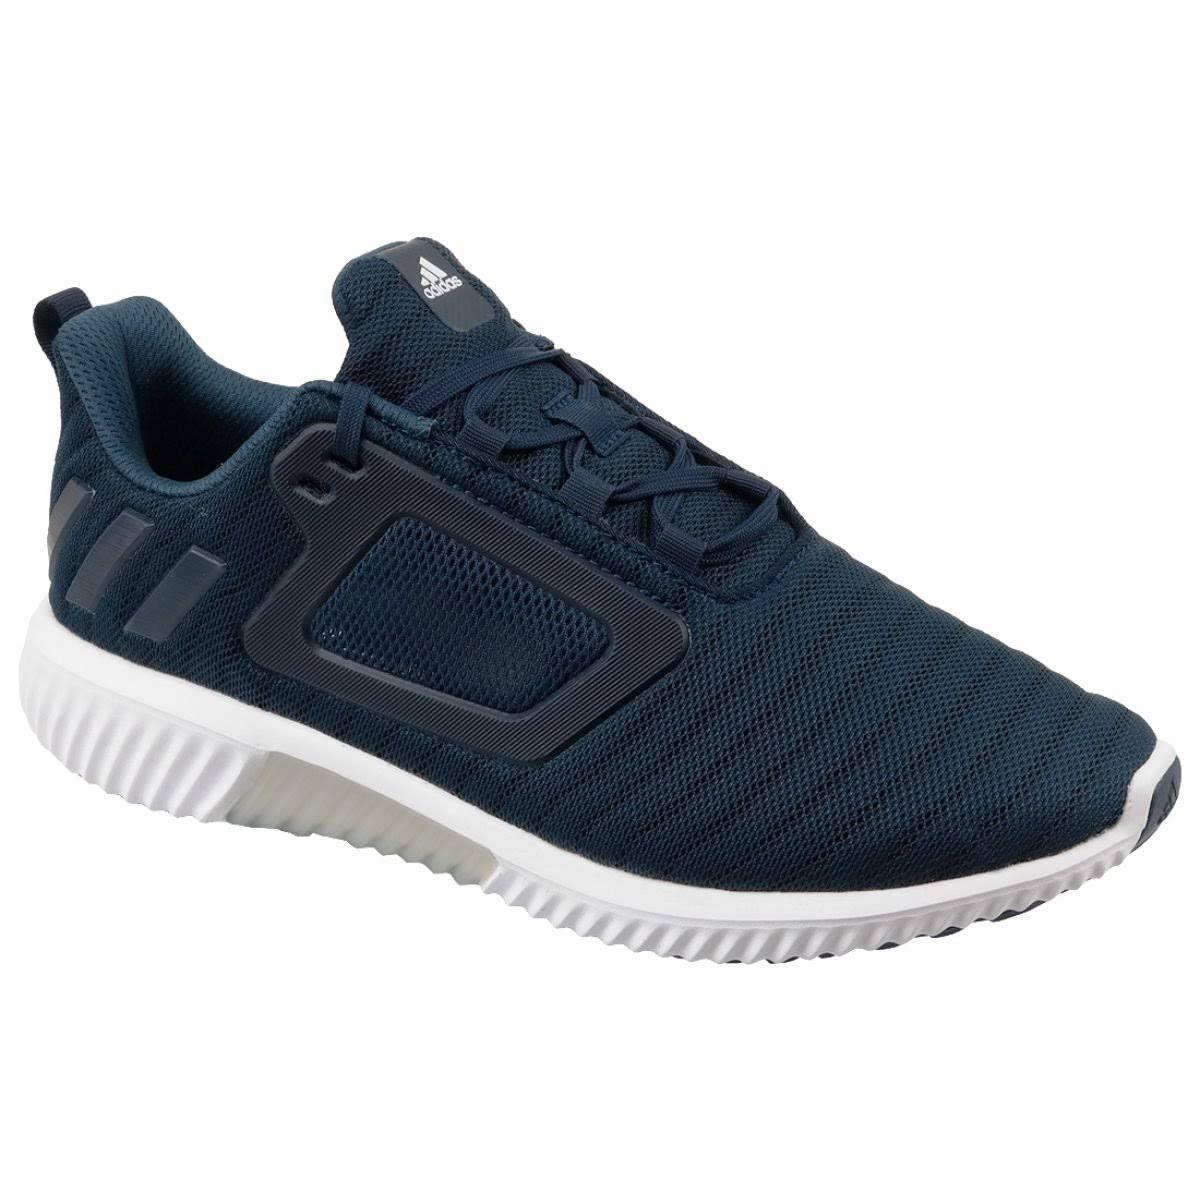 (8.5) Adidas Climacool cm